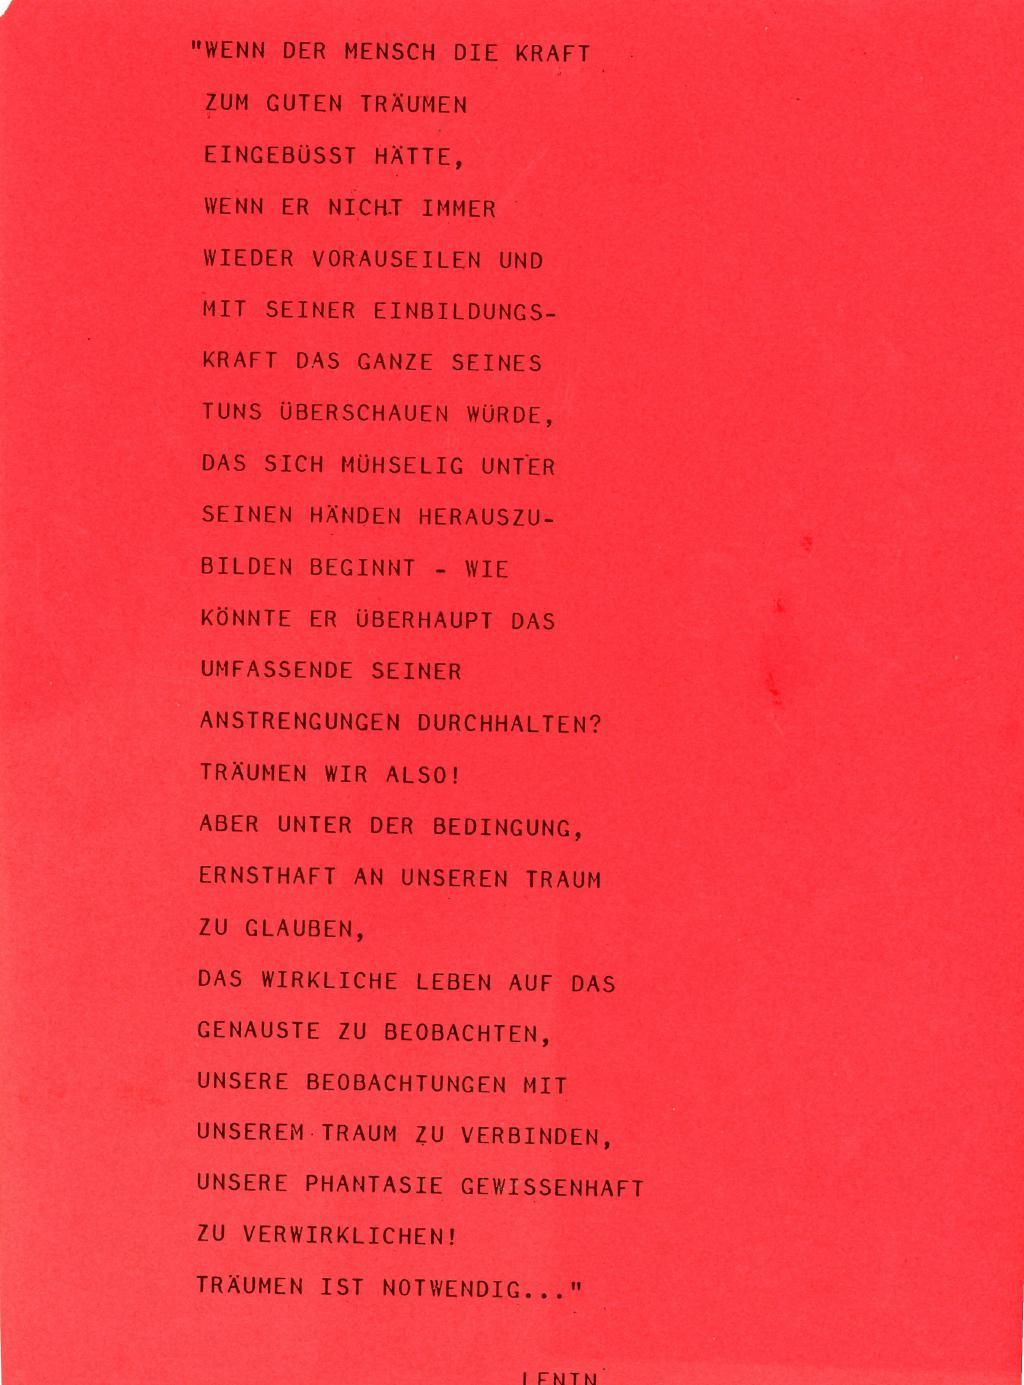 Berlin_1983_Autonome_Gruppen_Faschismus_im_Kapitalismus_67